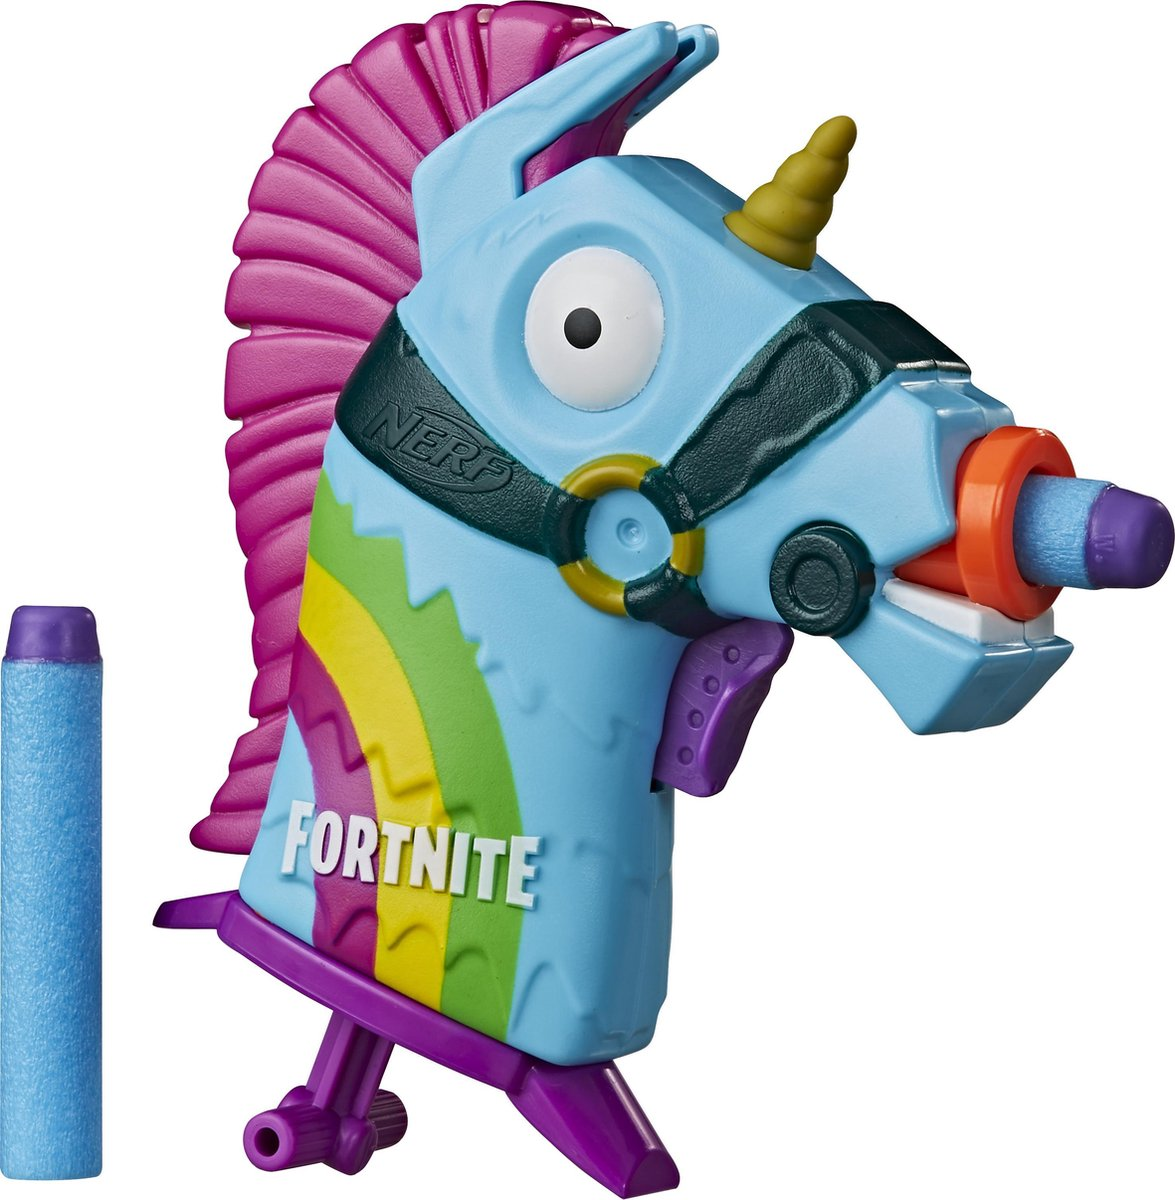 NERF blaster Fortnite Rainbow Smash junior 21 cm blauw/paars